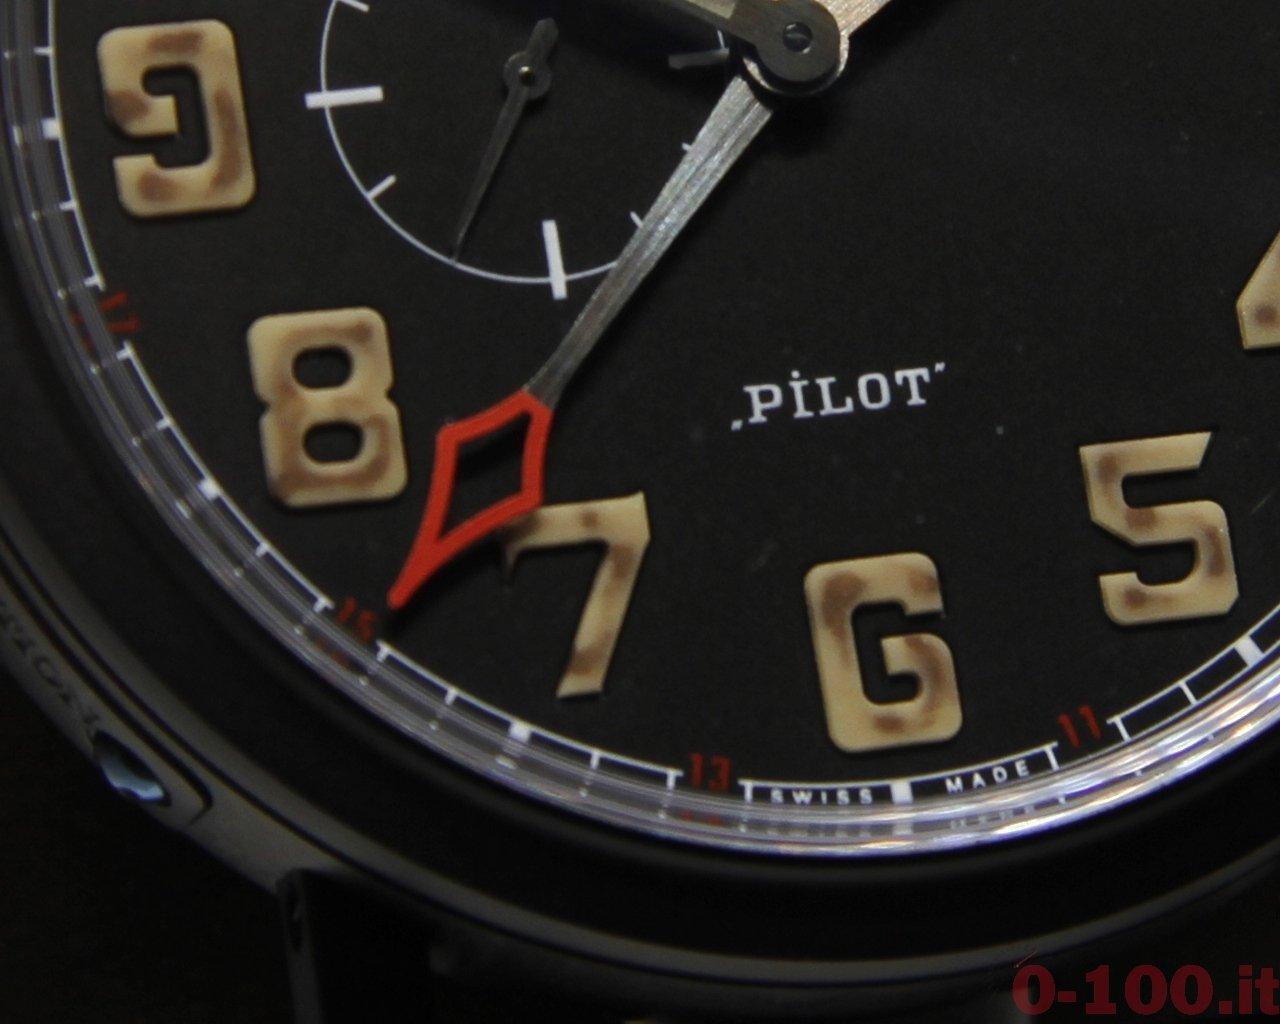 zenith-pilot-montre-daeronef-type-20-gmt-1903-baselworld-2014_9